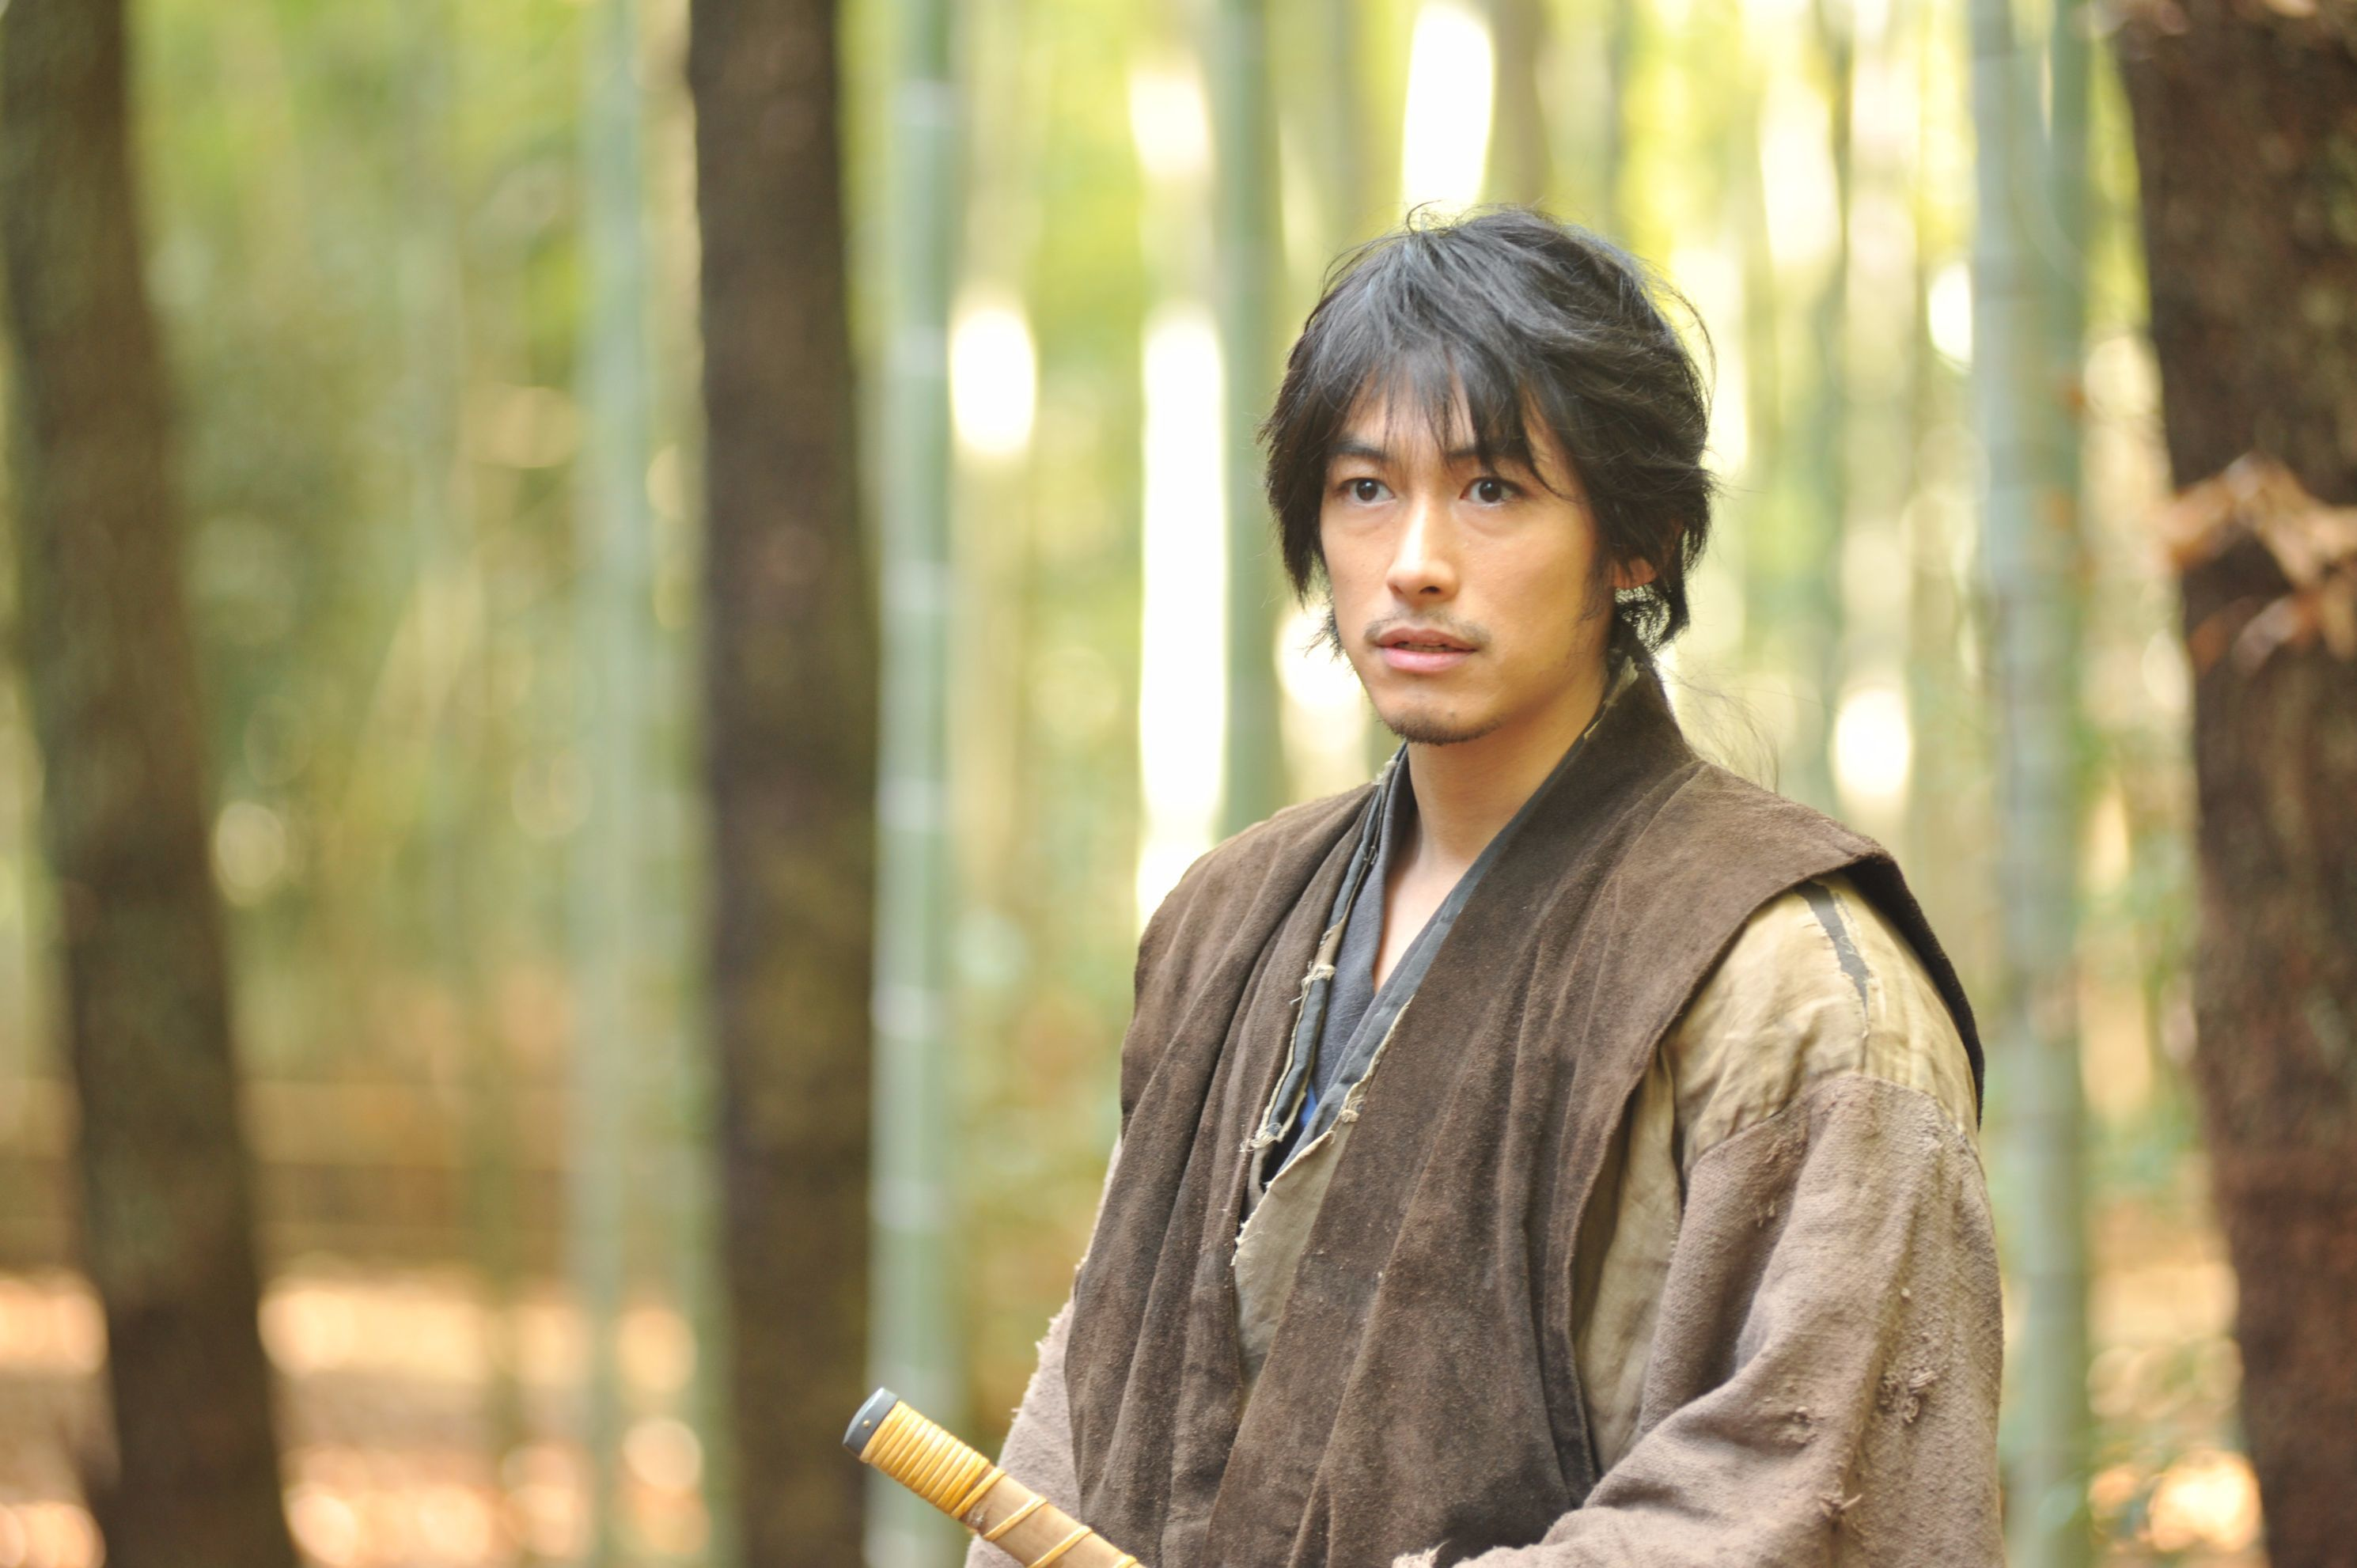 『NINJA THE MONSTER』 ディーン・フジオカ (C)2015 松竹